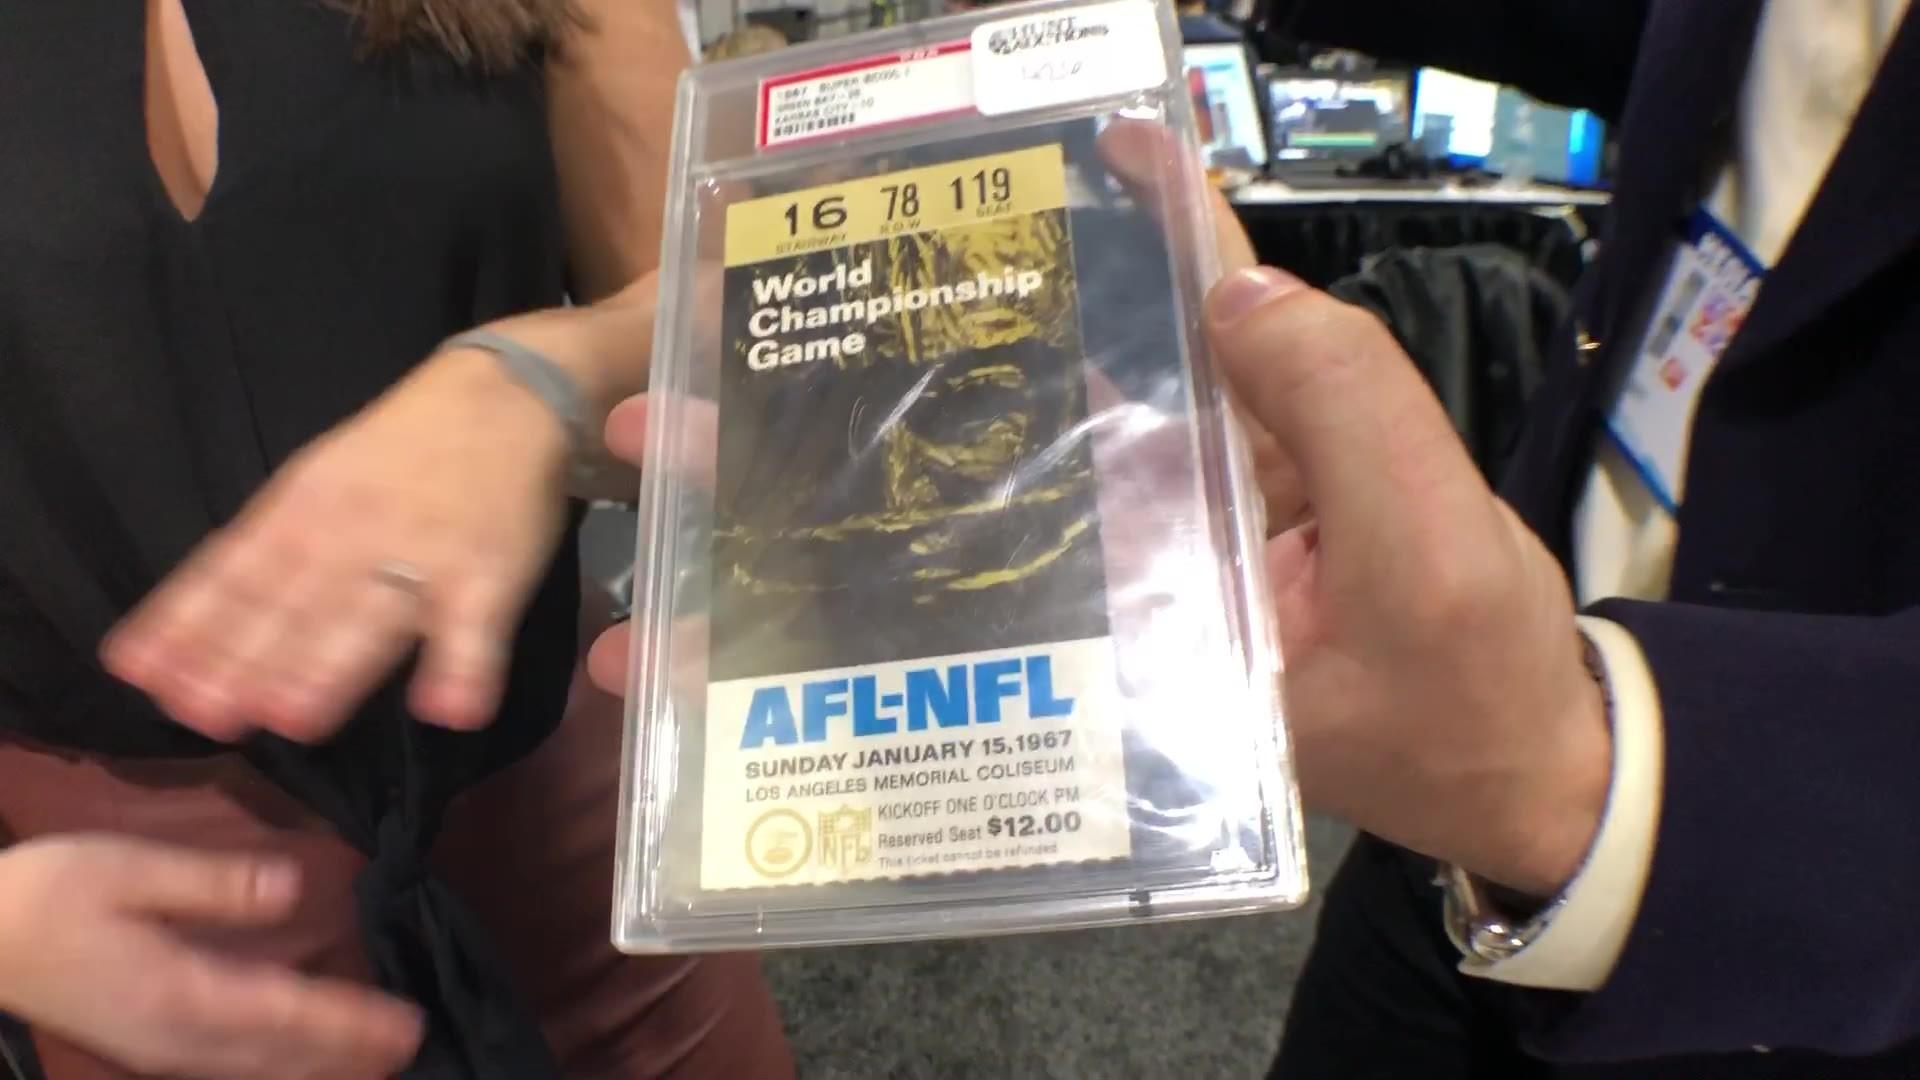 Big Game Memorabilia: 1967 NFL championship ticket, Game-worn Matt Ryan jersey